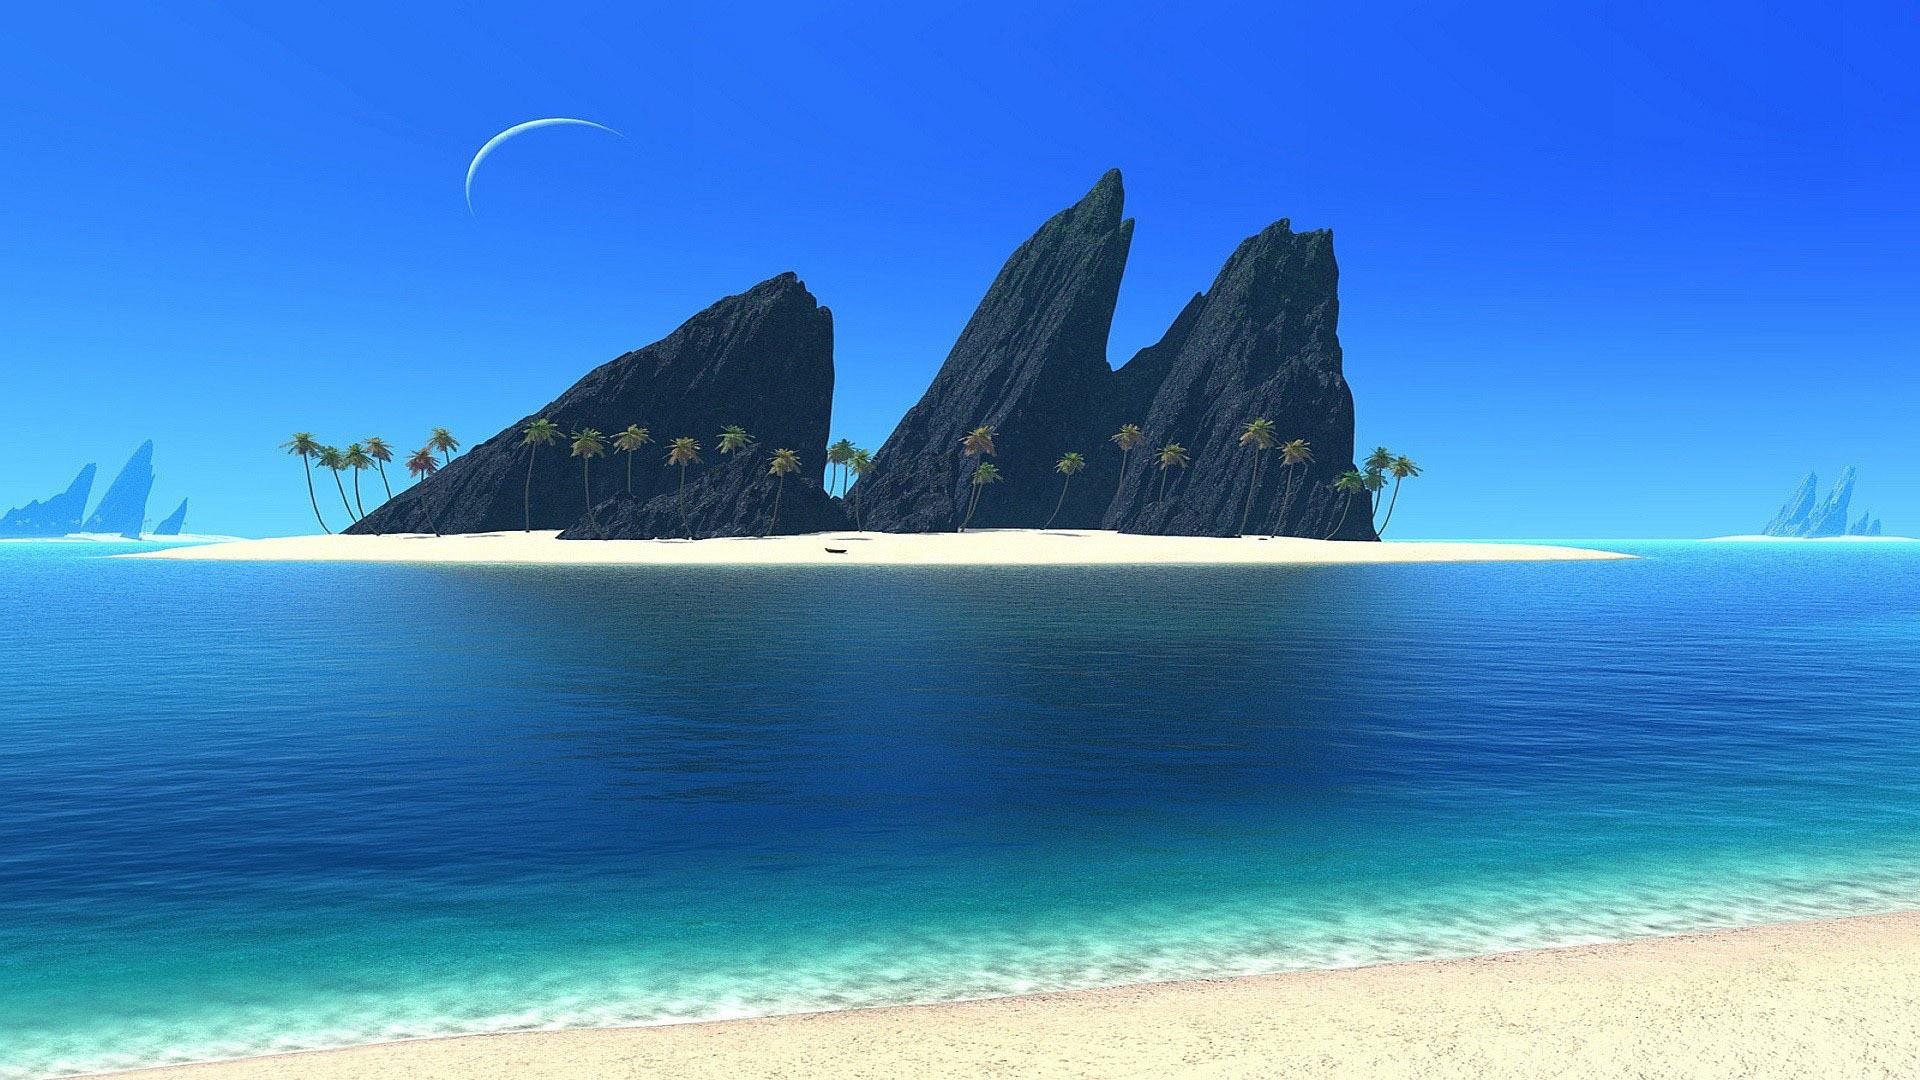 Sunny Beach Wallpaper Widescreen